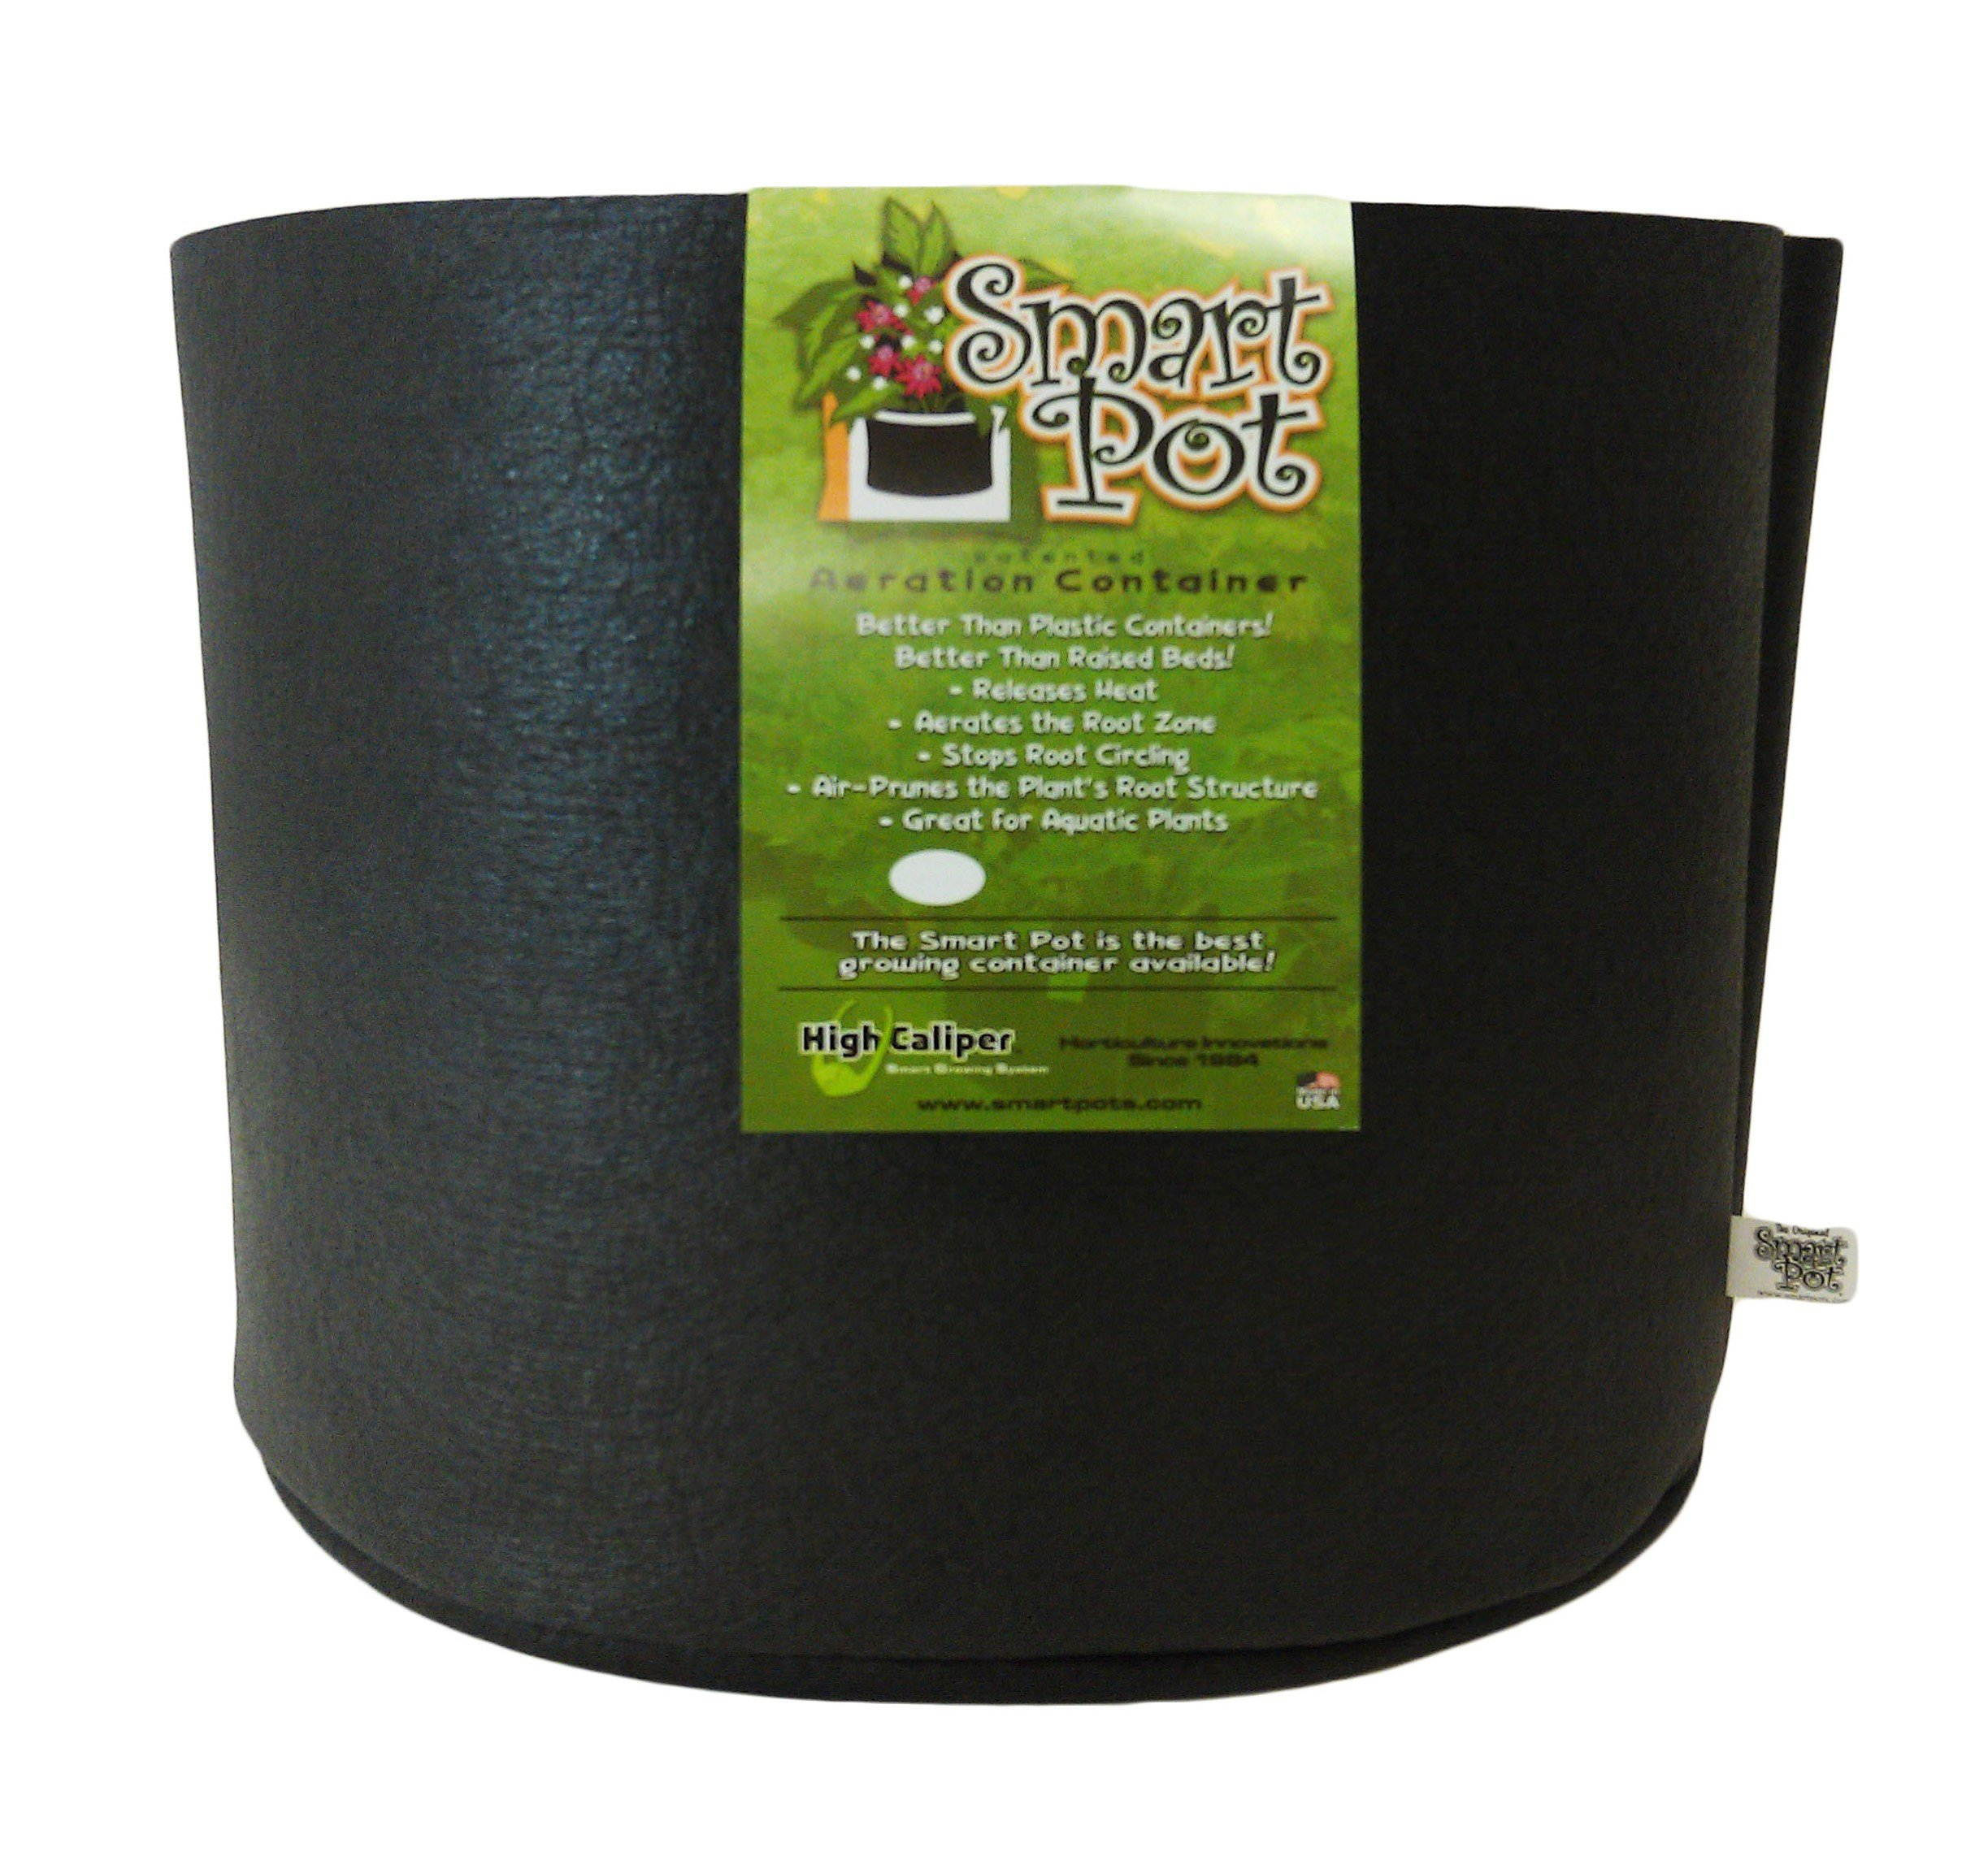 Smart Pots Compost Sak Fabric Composting Container